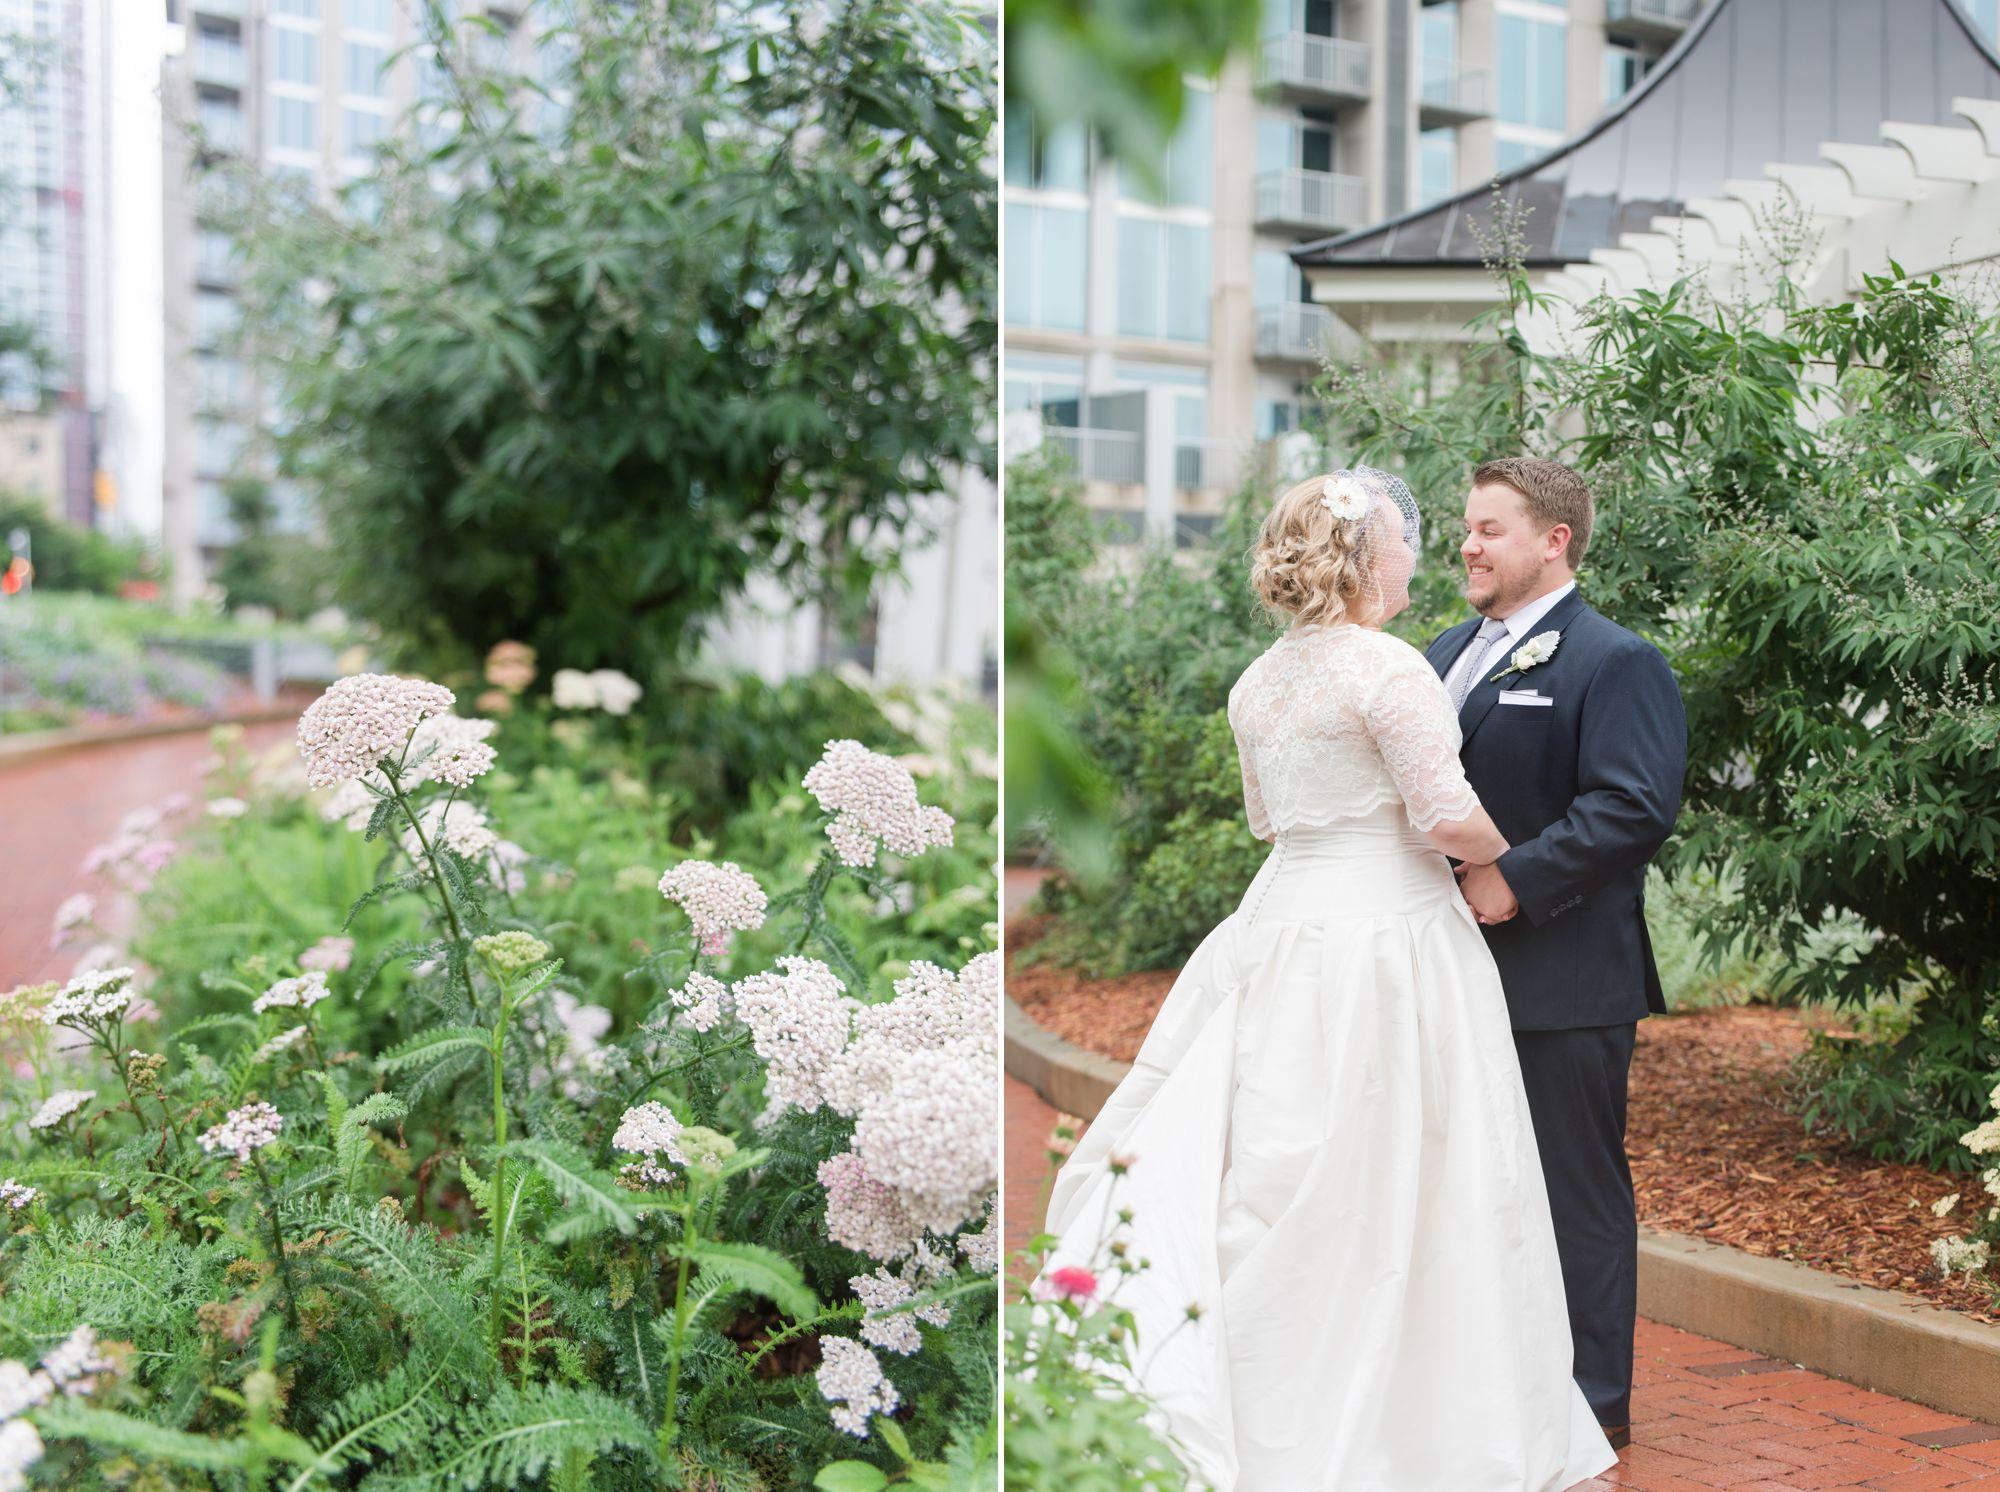 uptown-charlotte-warhouse-wedding 37